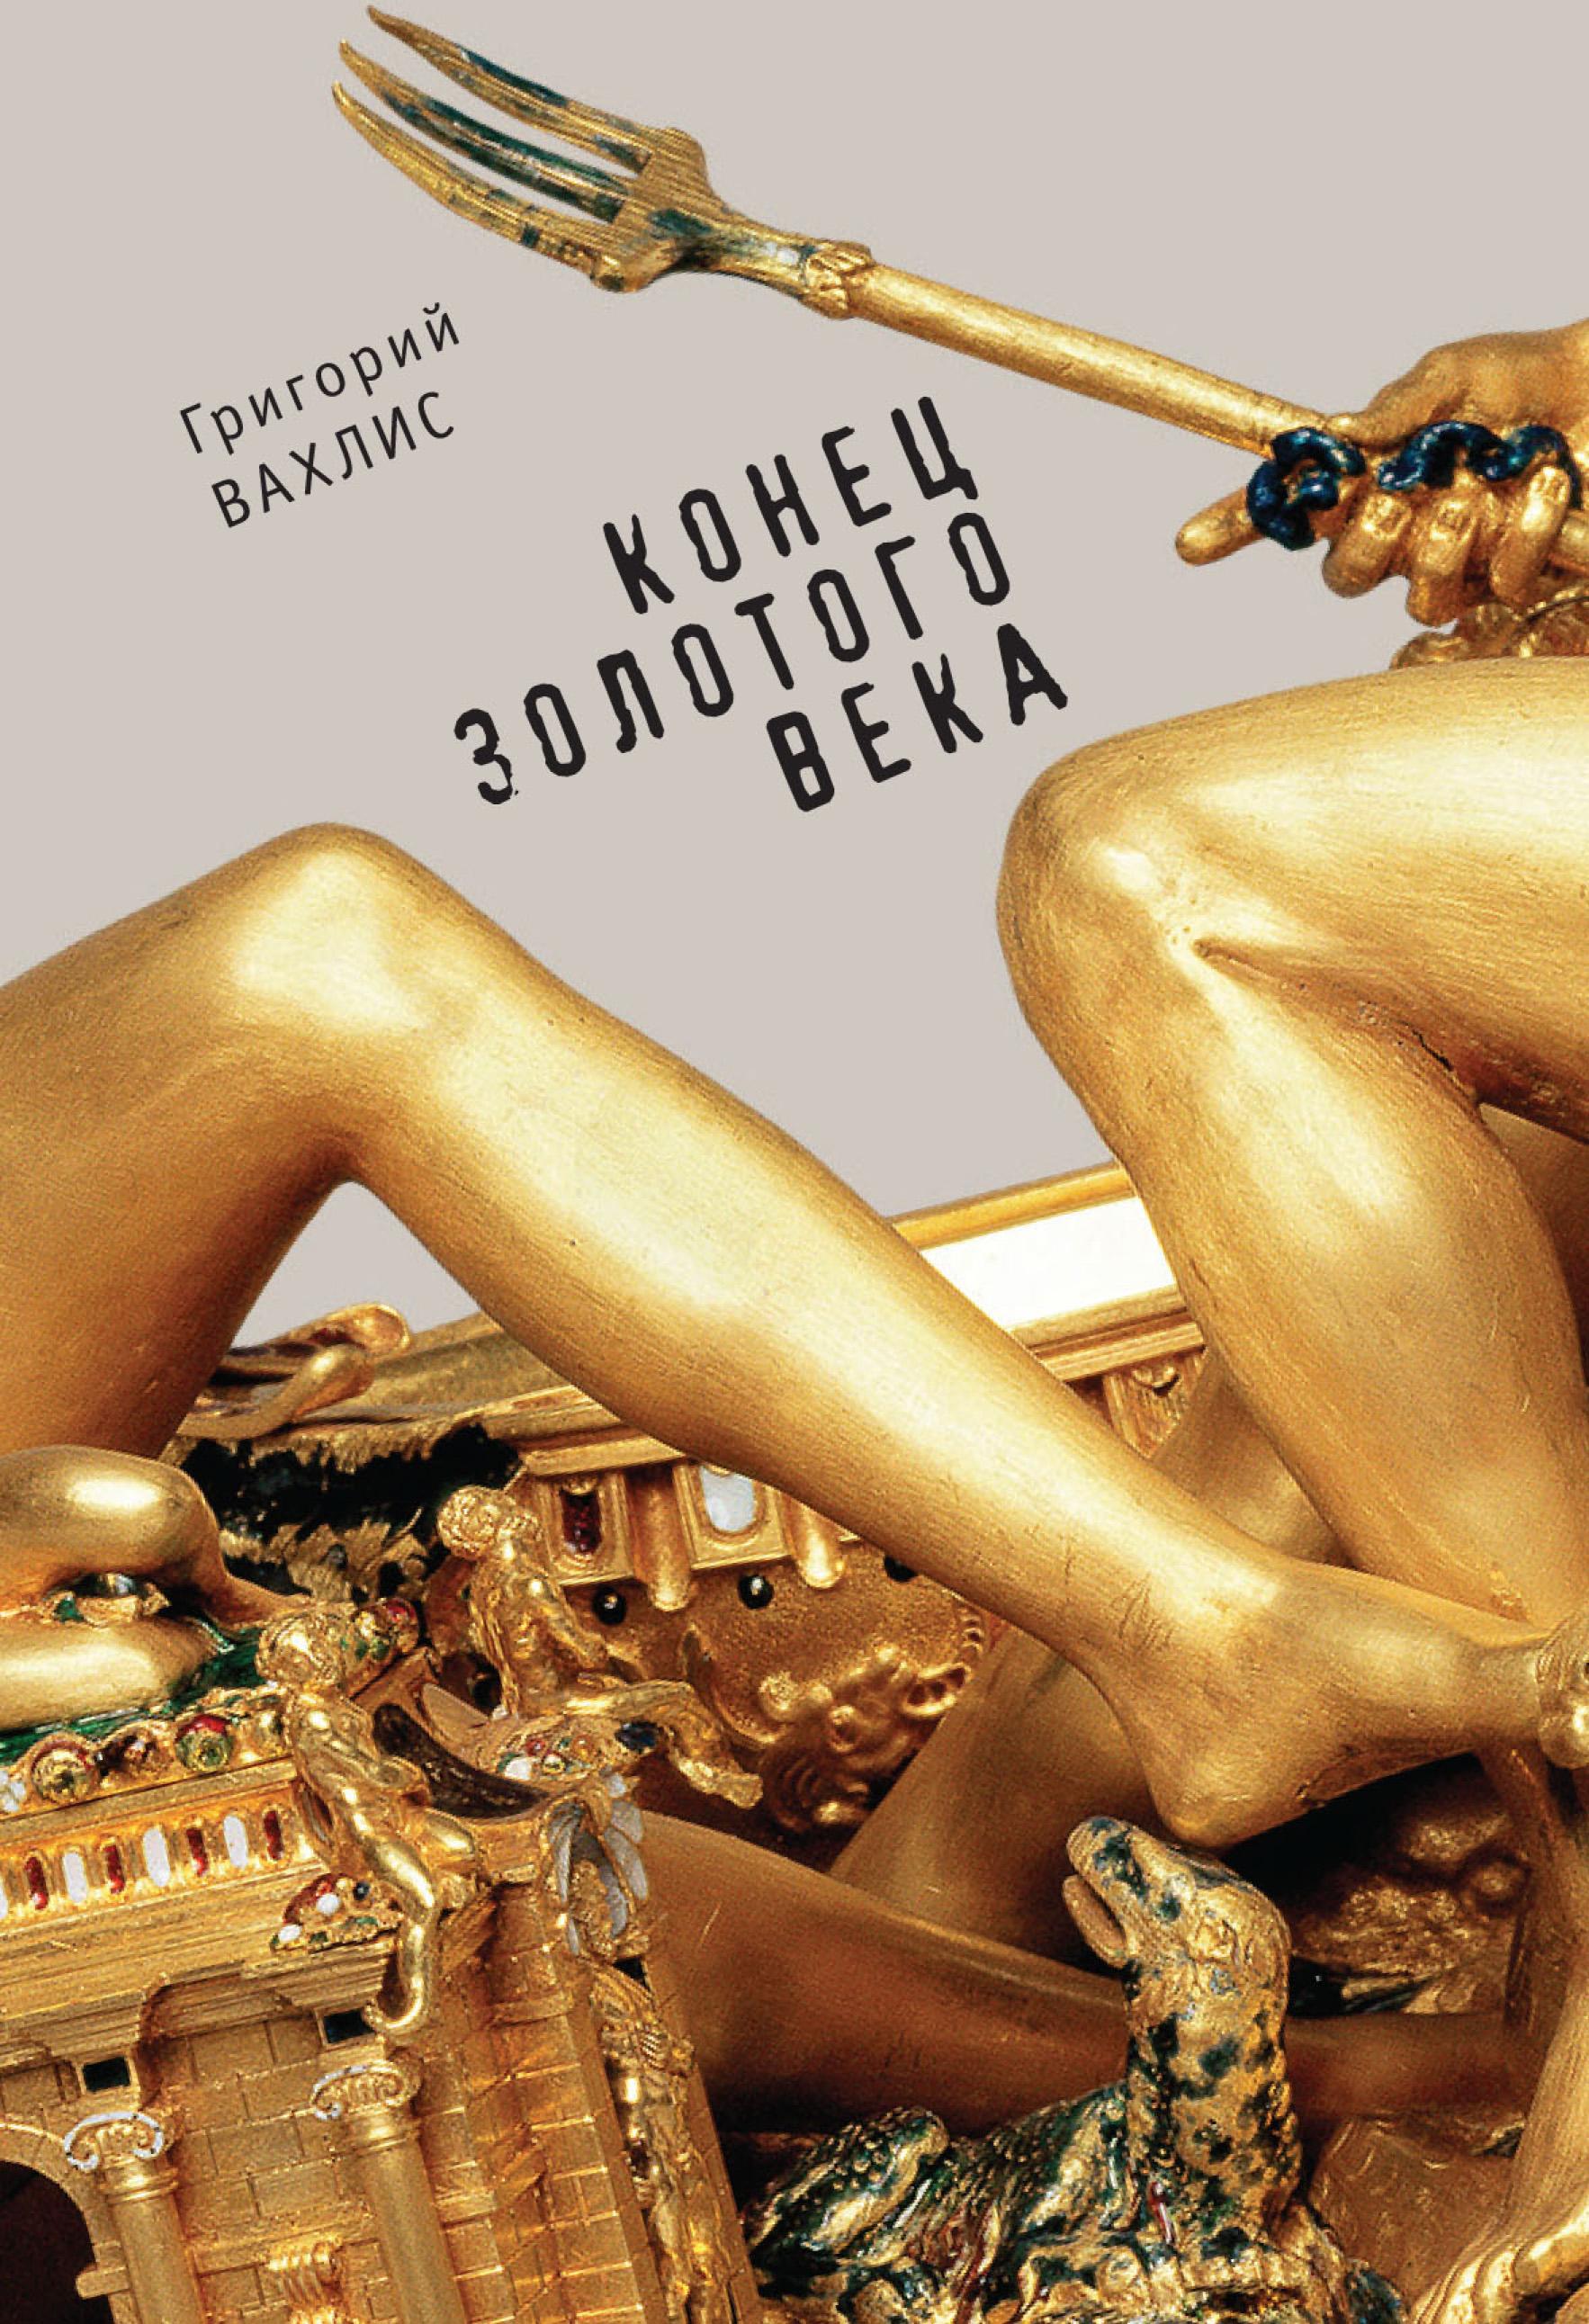 Григорий Вахлис Конец золотого века вахлис г конец золотого века